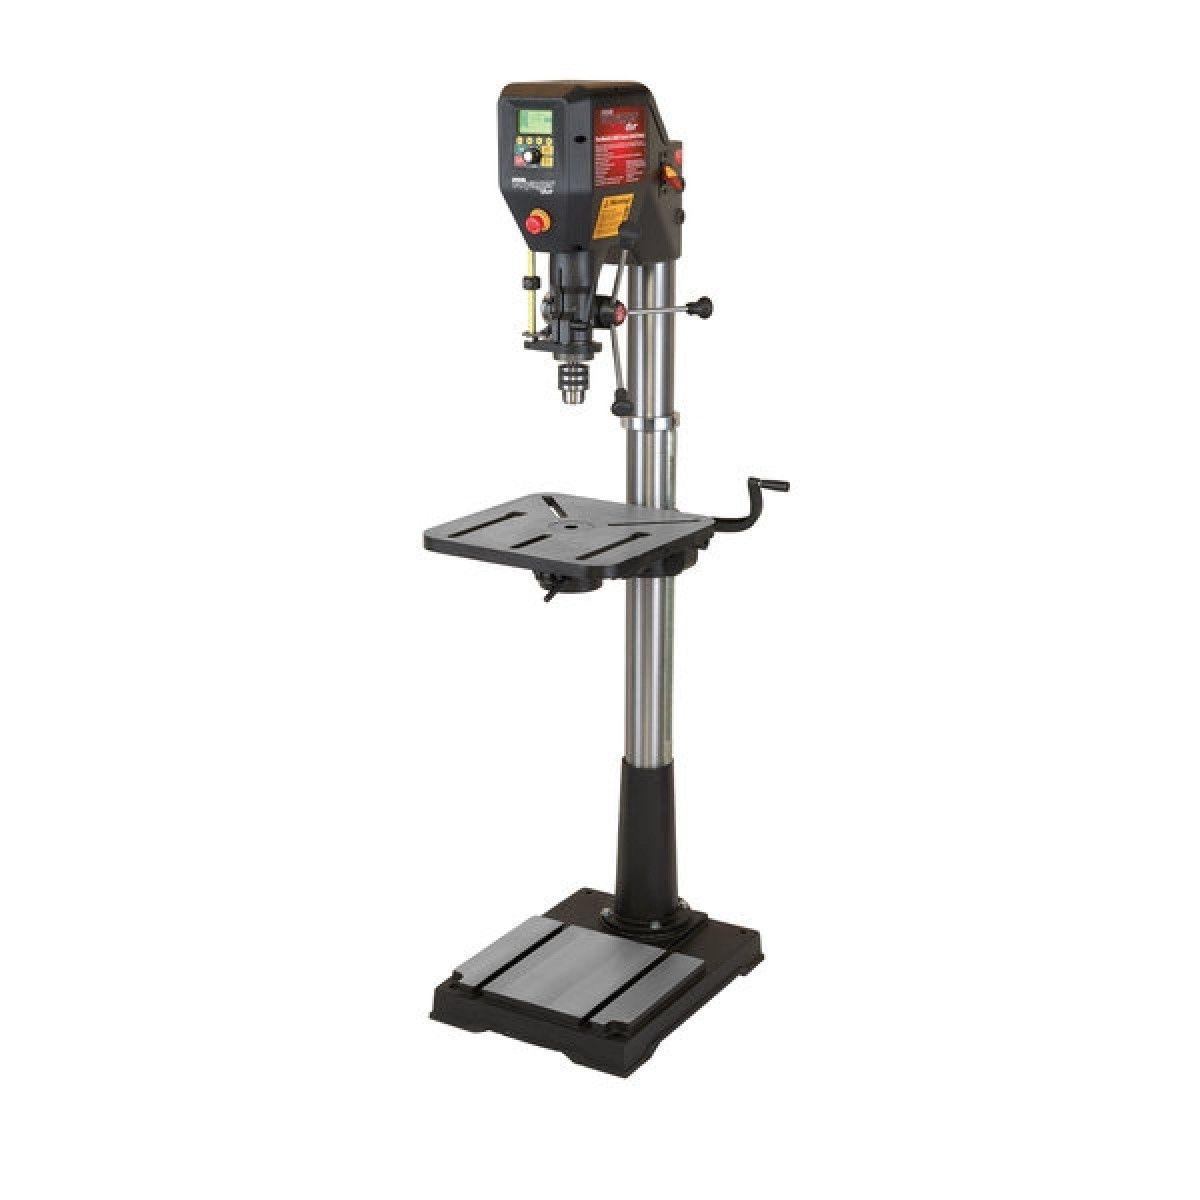 teknatool nova voyager dvr drill press drill press manual outdoor power equipment stuff [ 1200 x 1200 Pixel ]